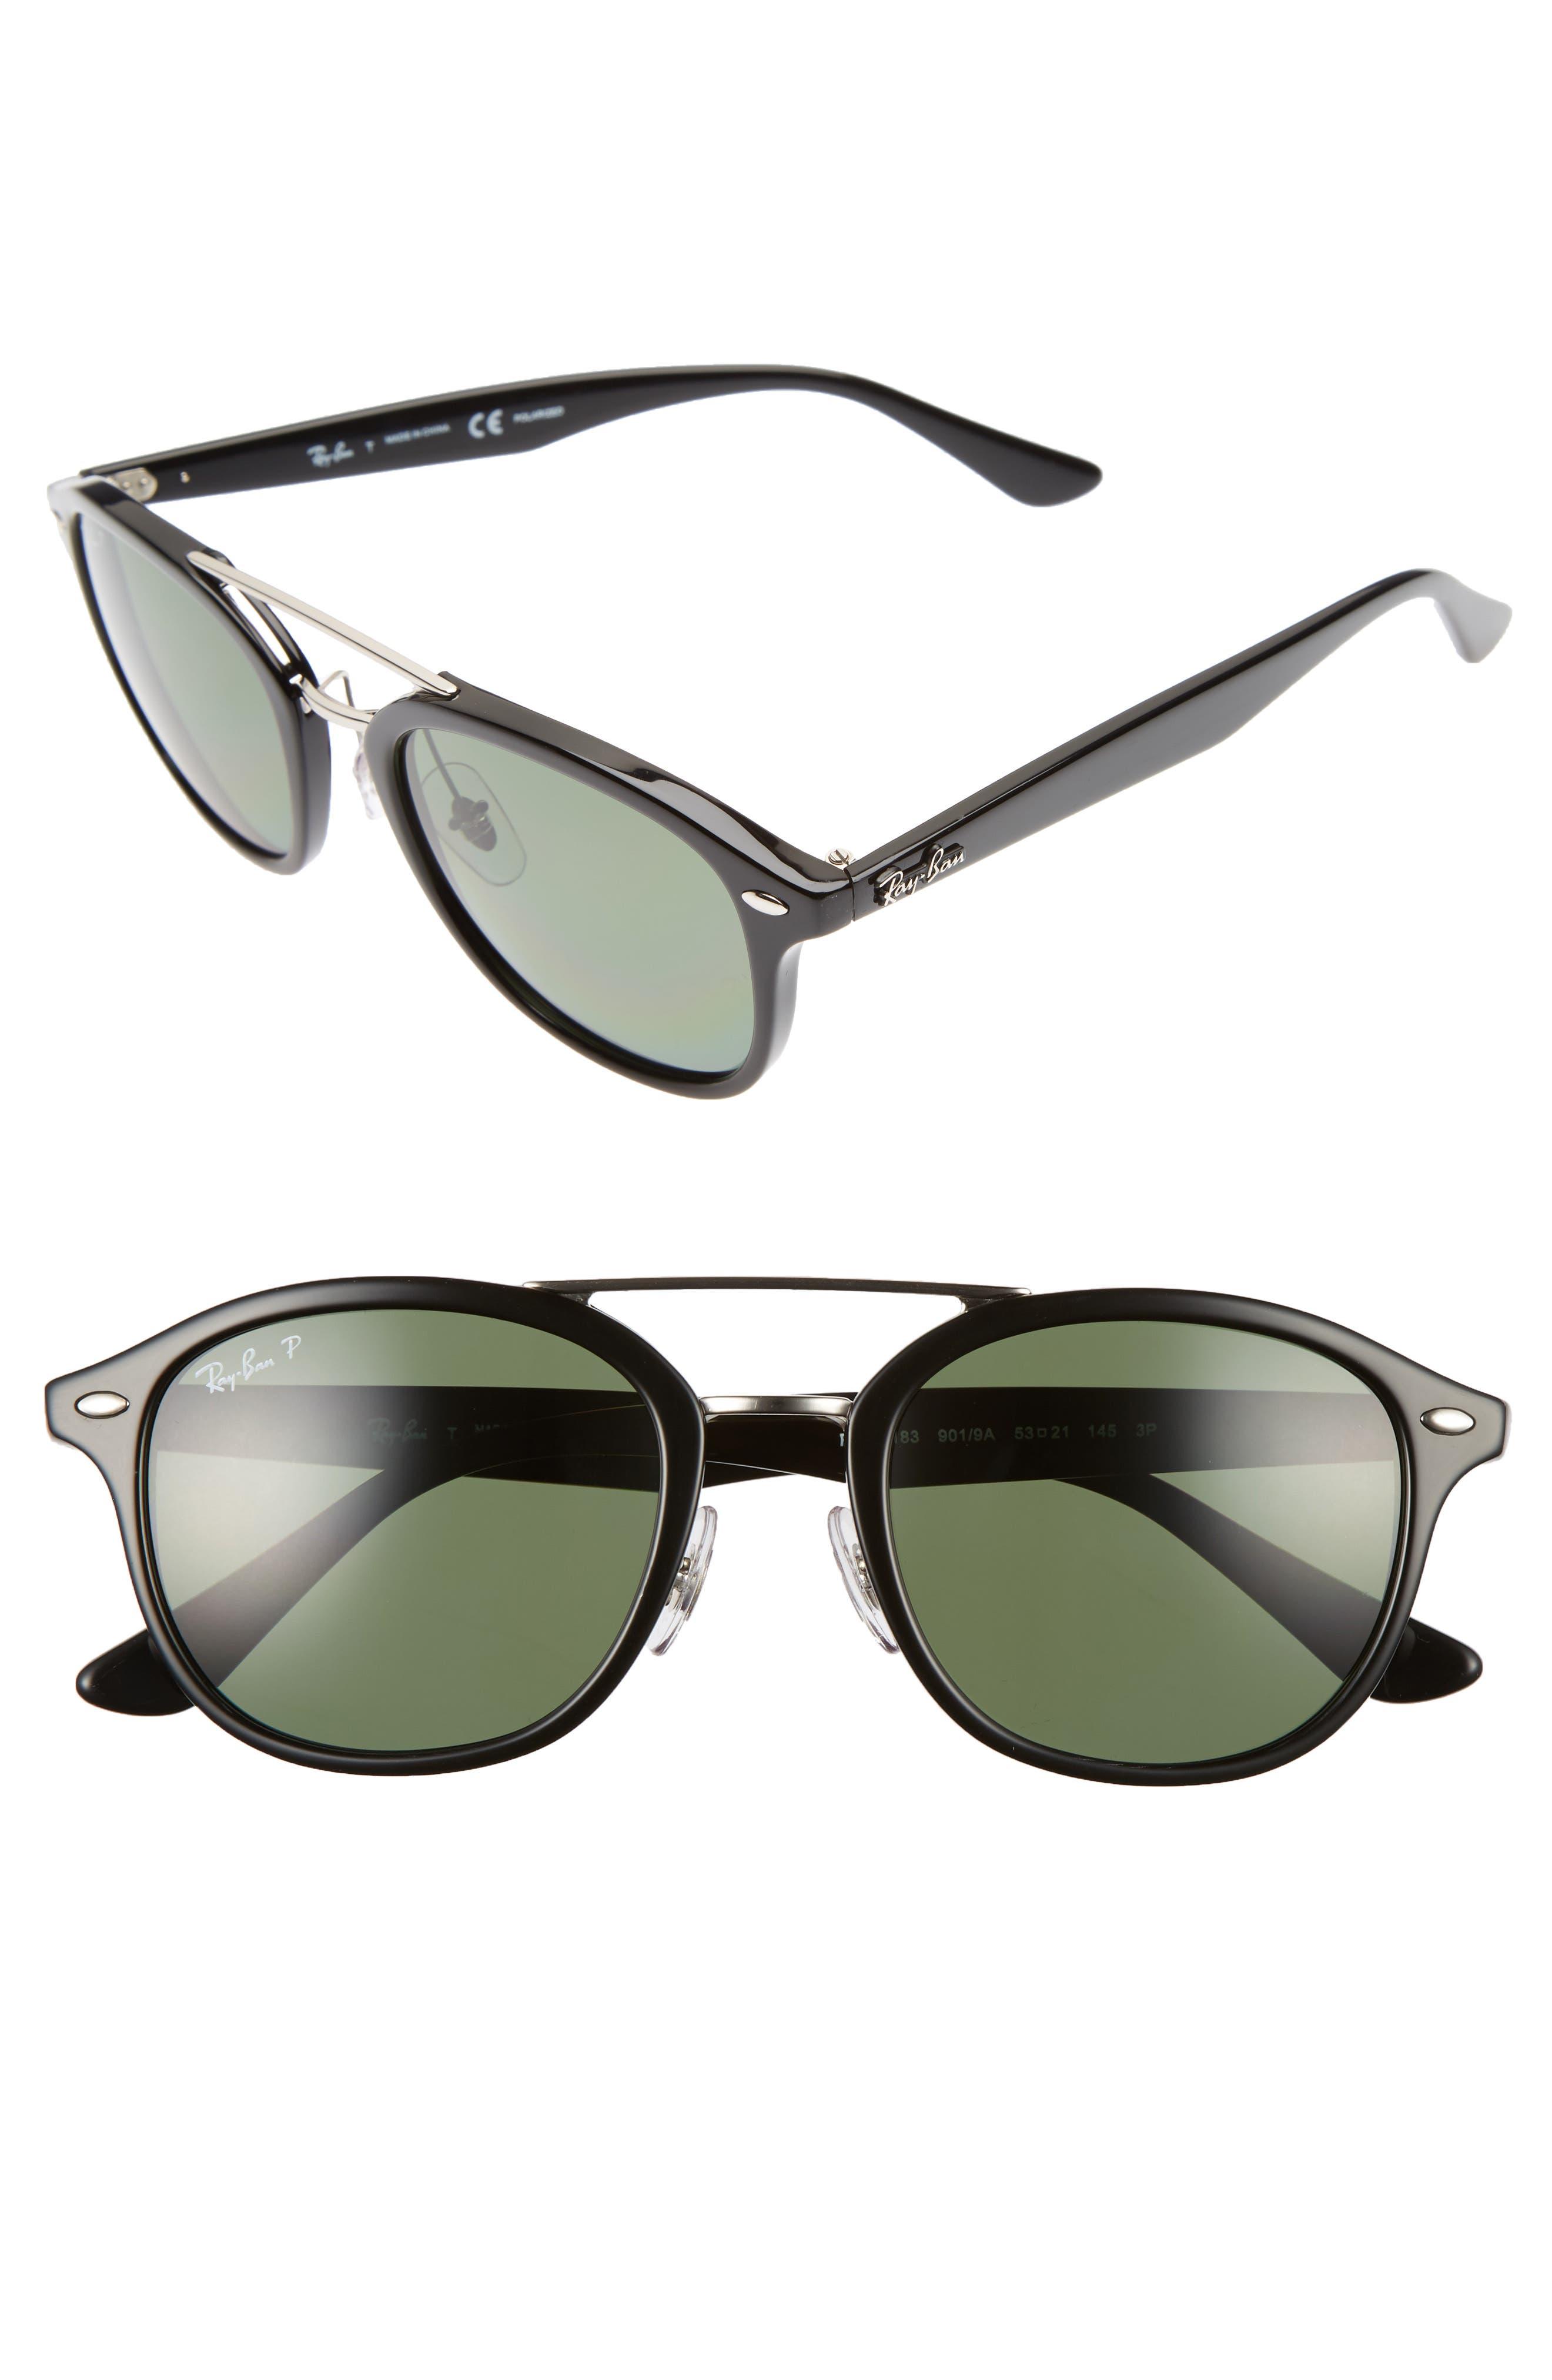 53mm Polarized Sunglasses,                             Main thumbnail 1, color,                             001